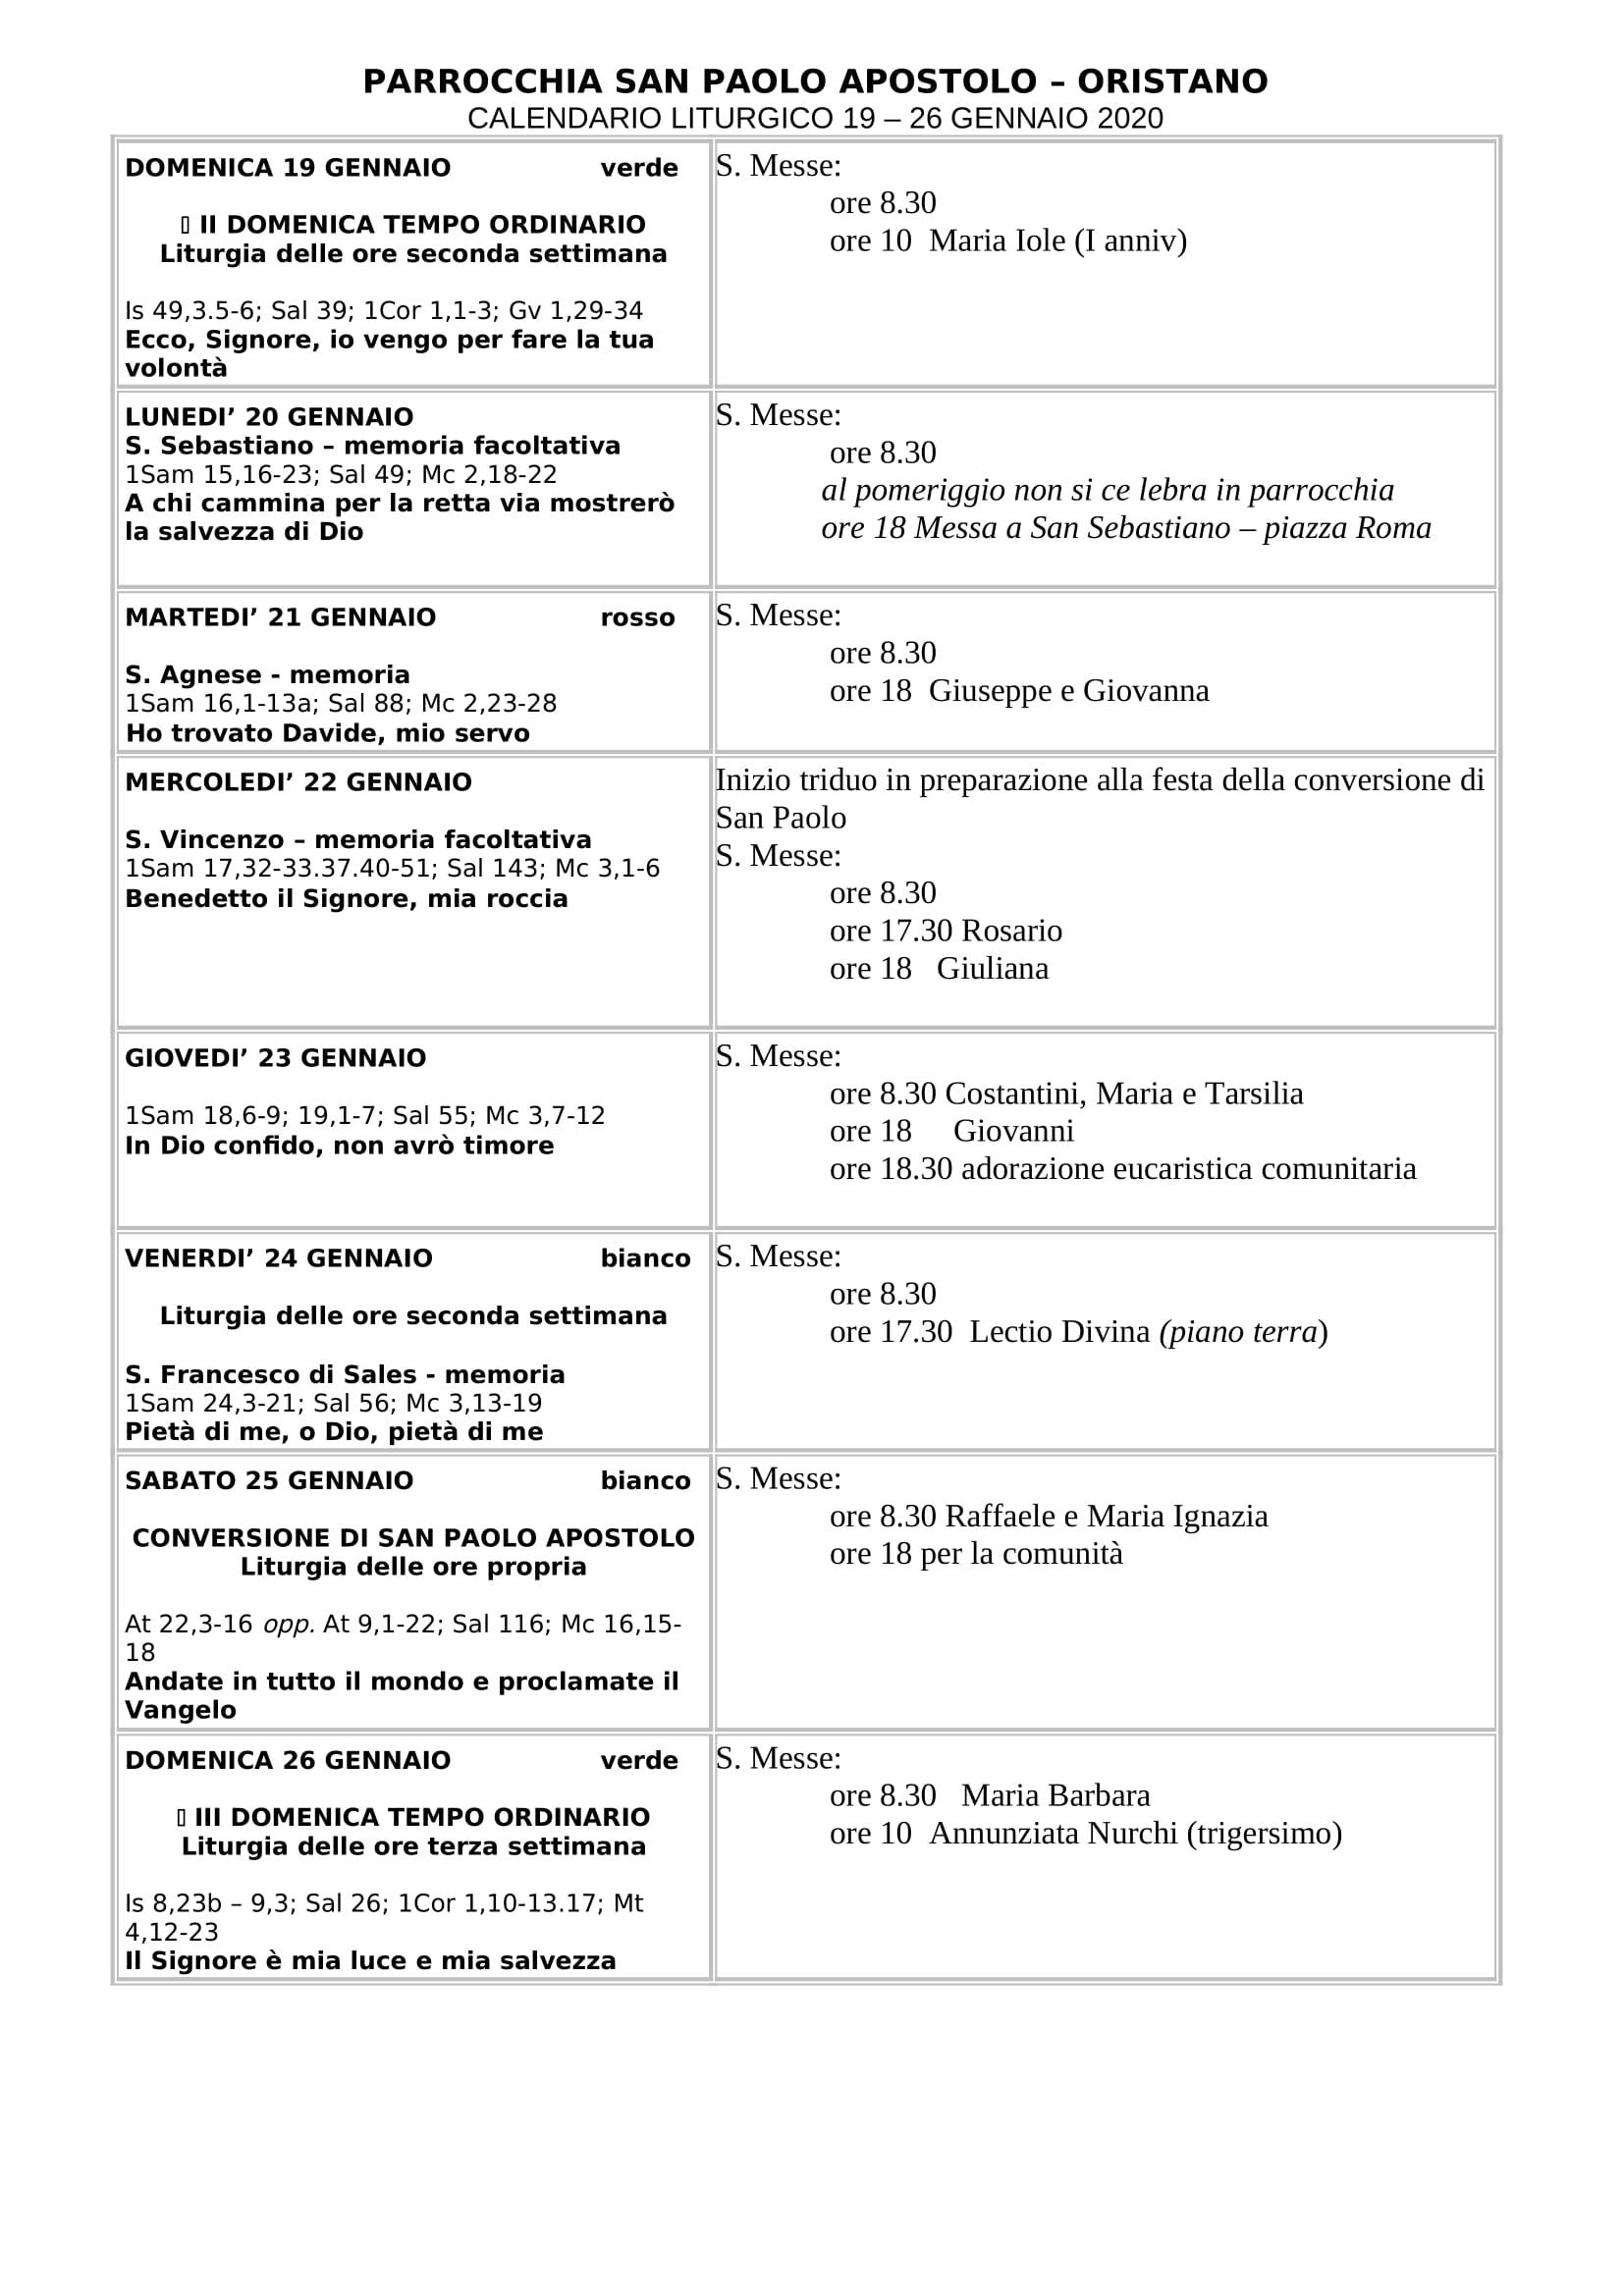 calendario liturgico 19-26 gennaio